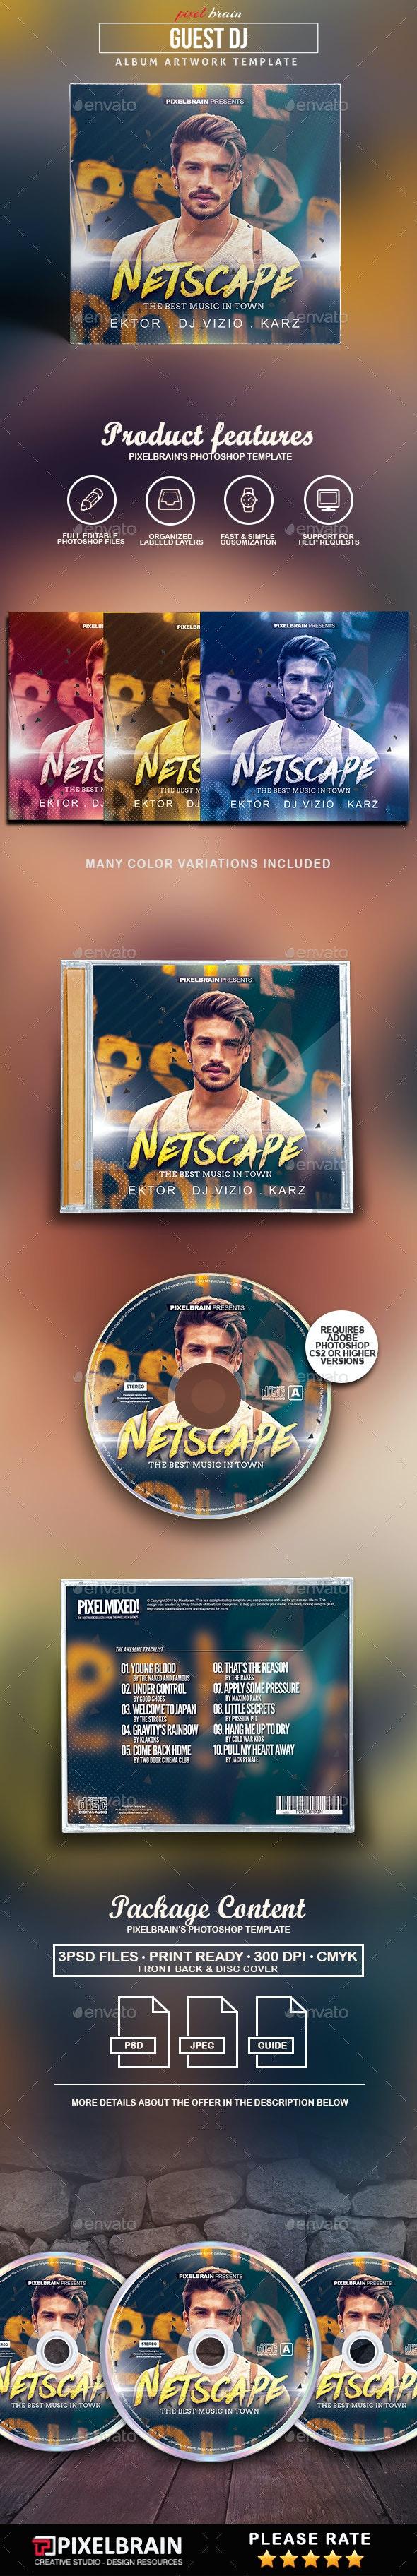 Guest Dj CD Cover Artwork - CD & DVD Artwork Print Templates